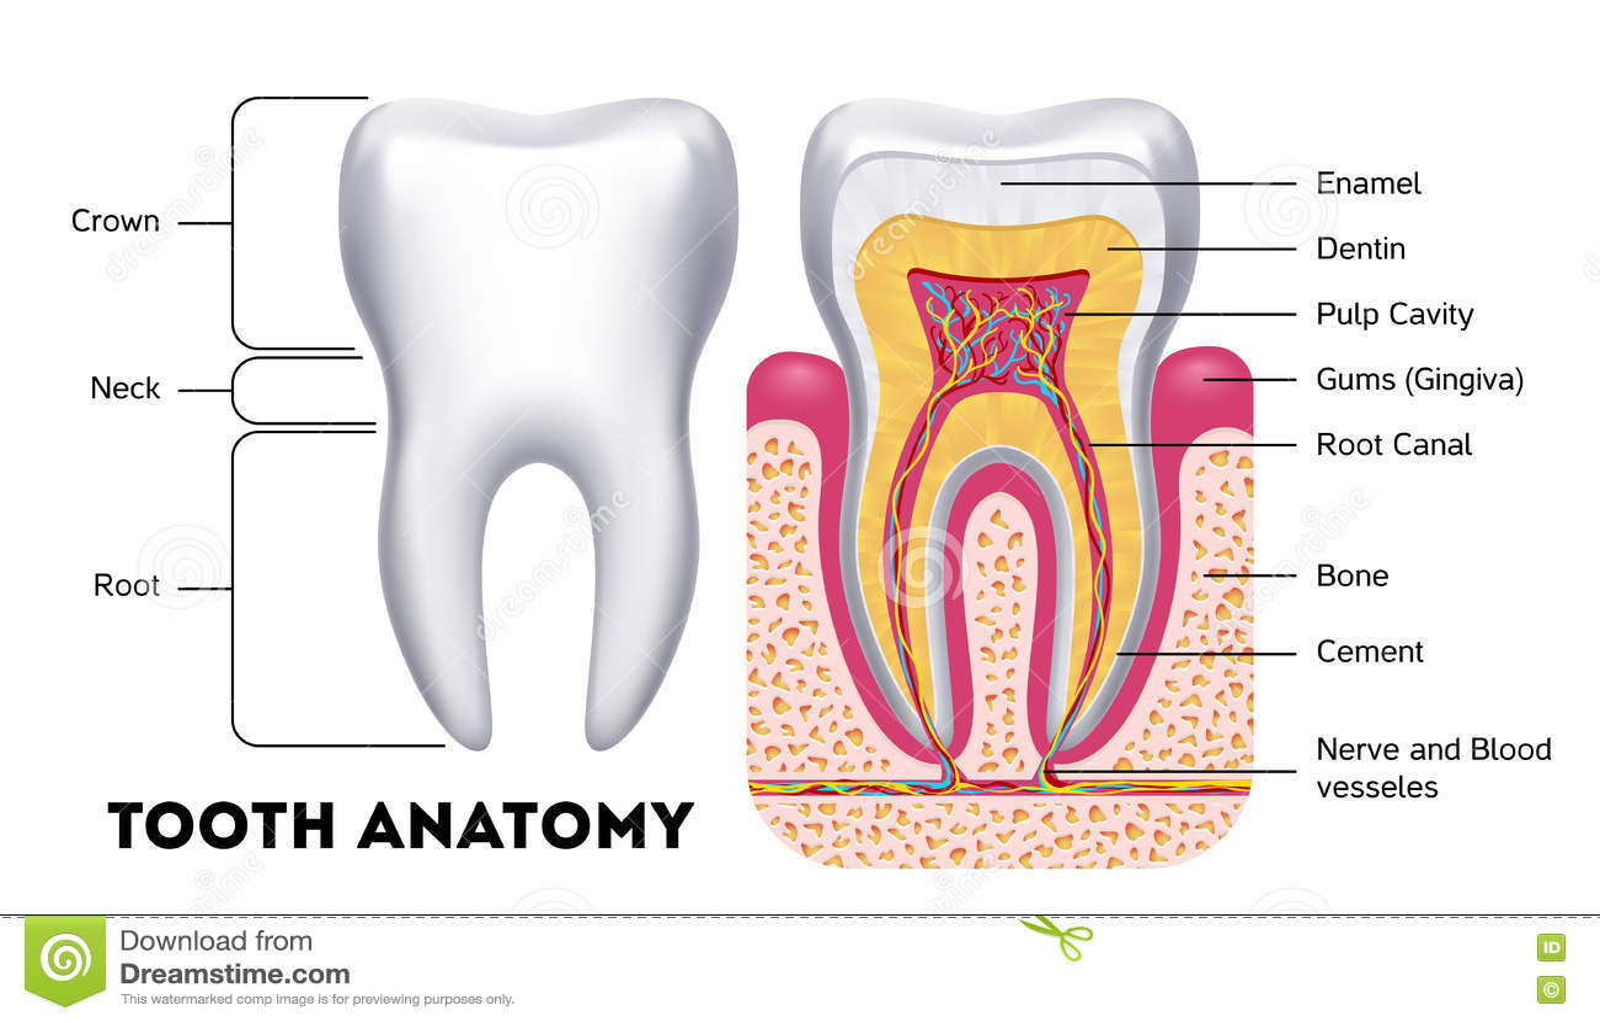 Tooth Anatomy Vector Dental Infographics Stock Vector - Illustration ...